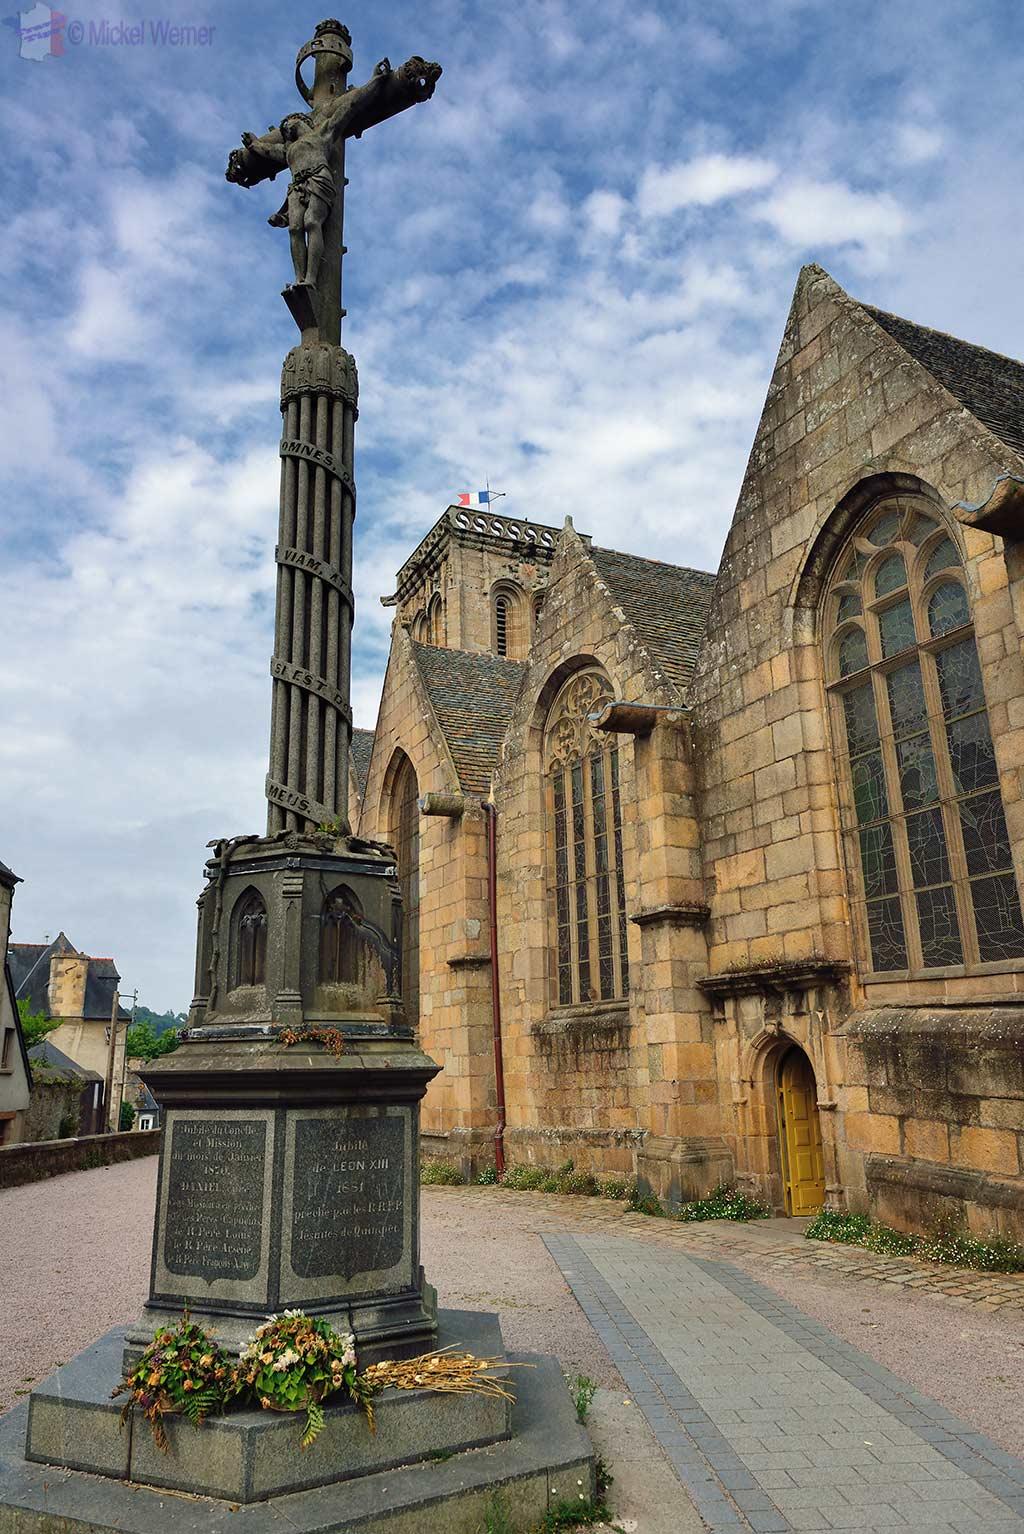 Saint-Jean-du-Baly church of Lannion, Brittany